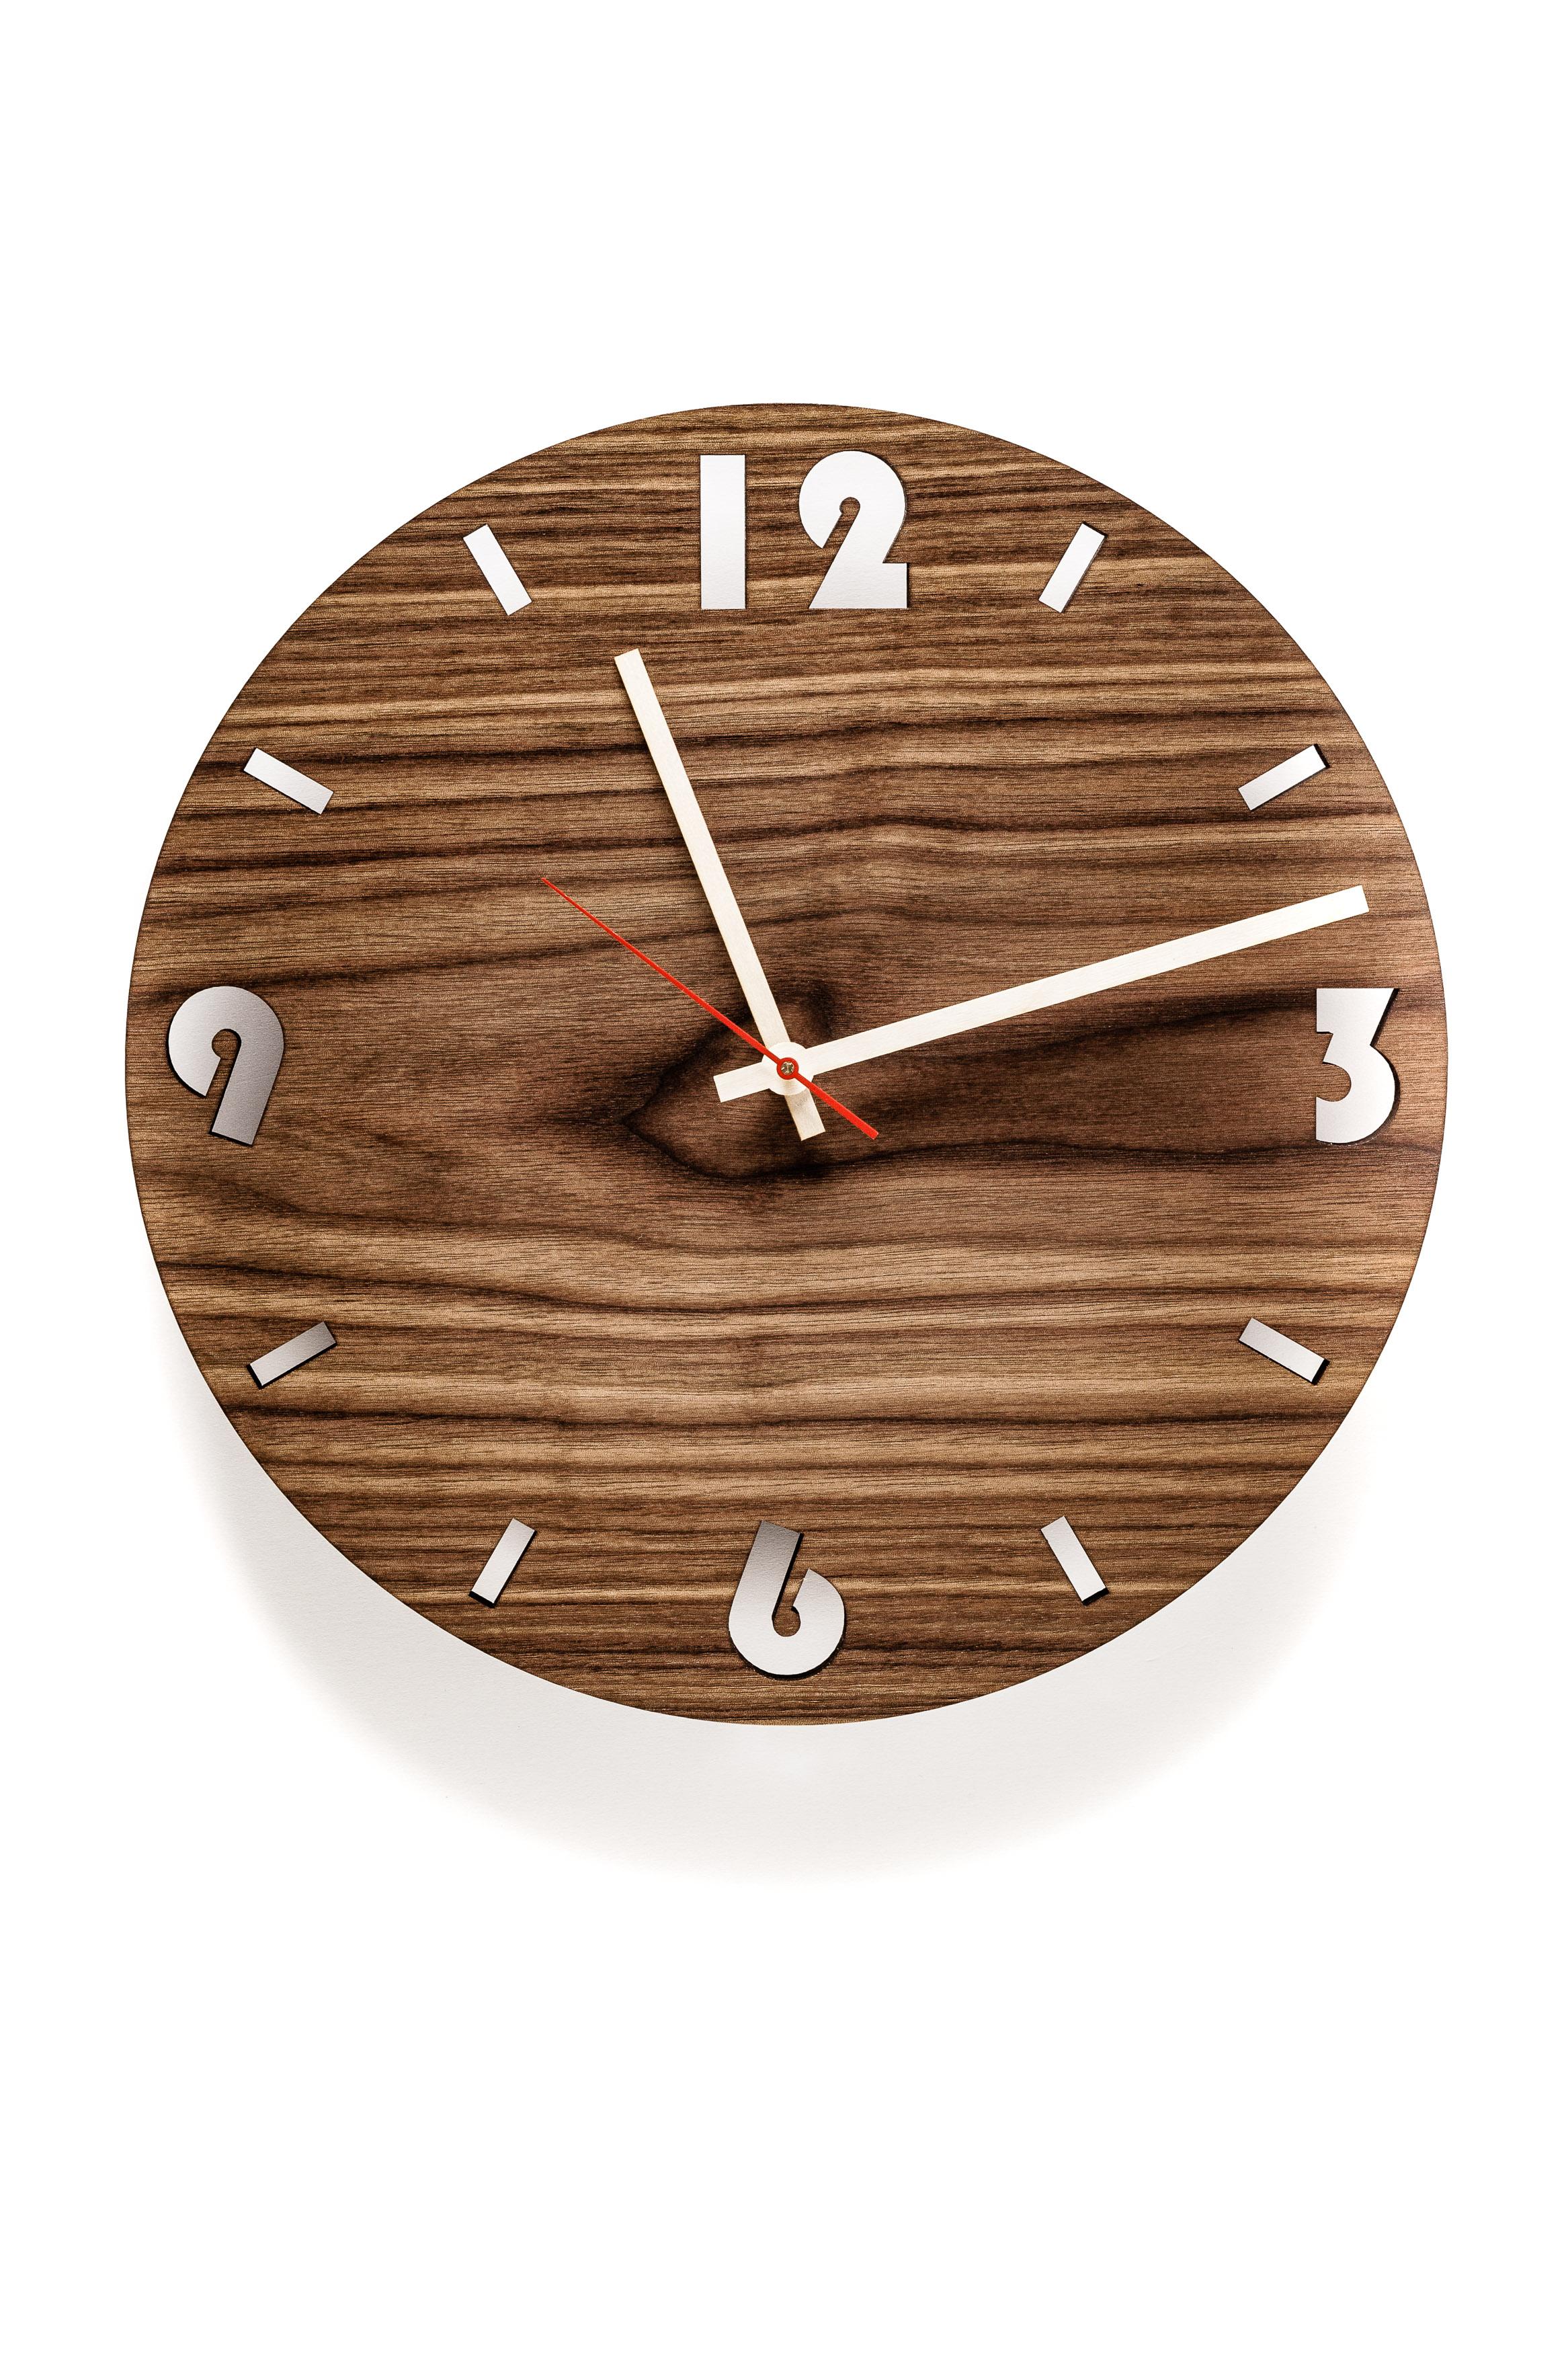 Holzmaserung Hervorheben wanduhren aus echtholz holzdekoladen de